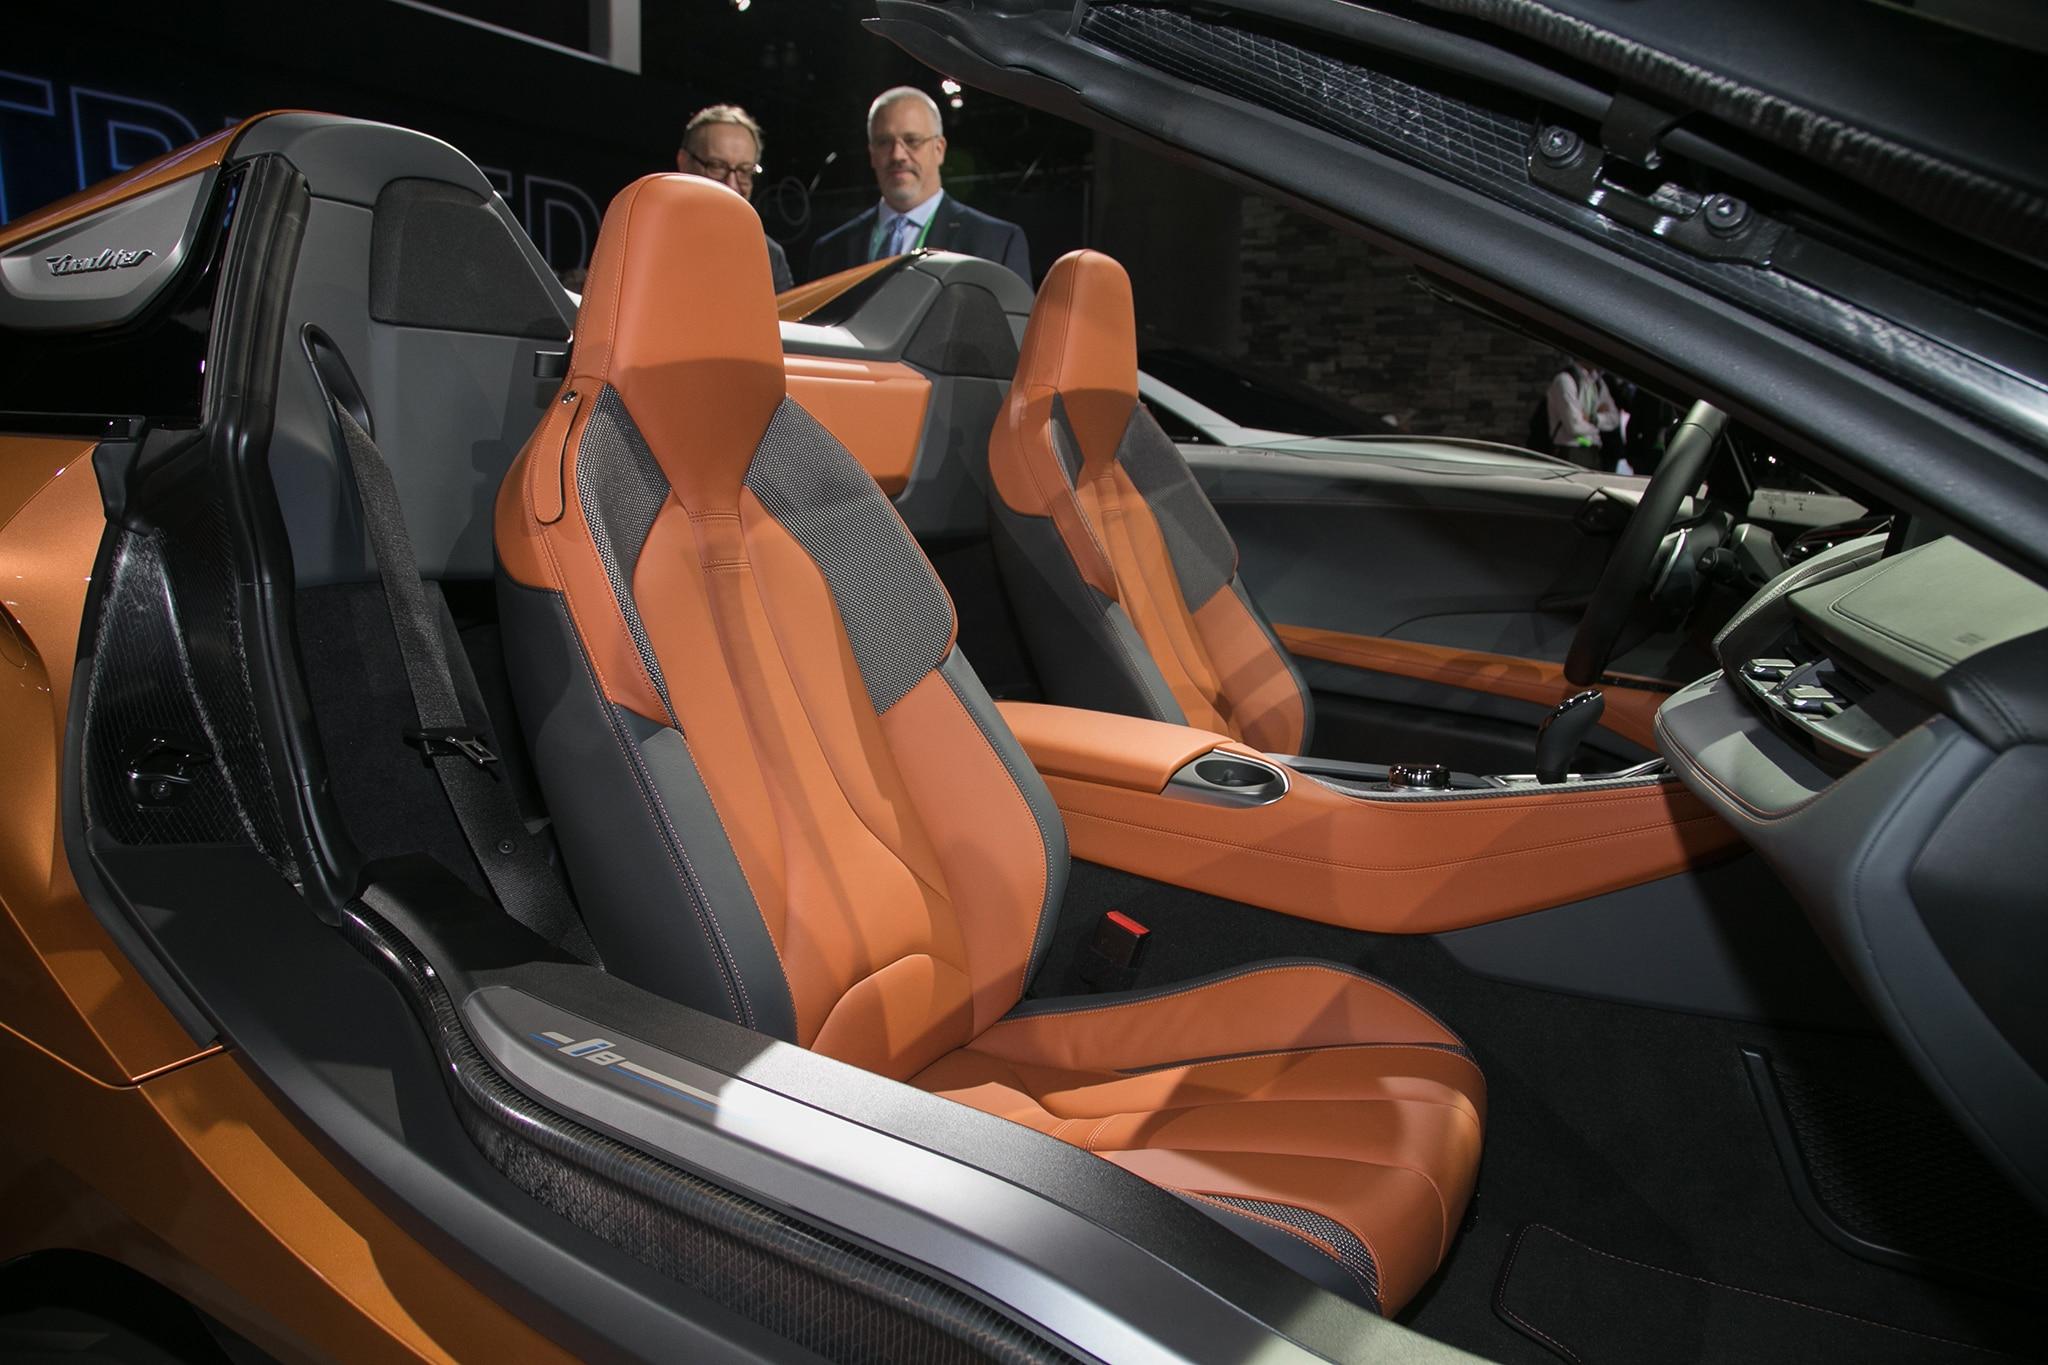 2019 Bmw I8 Roadster Arrives Alongside Updated Coupe Automobile